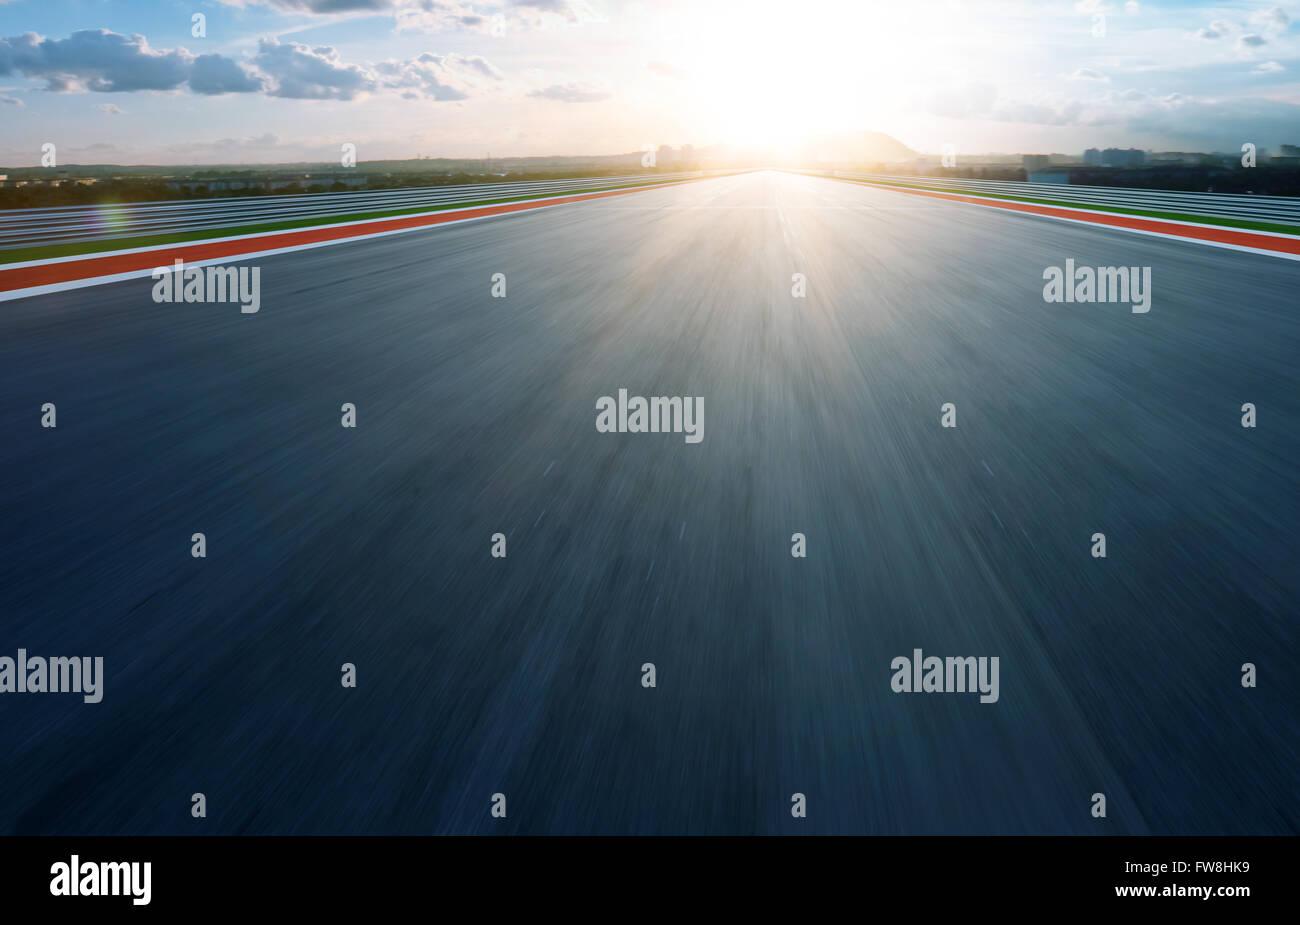 Moto autodromo sfocata,mattina Immagini Stock